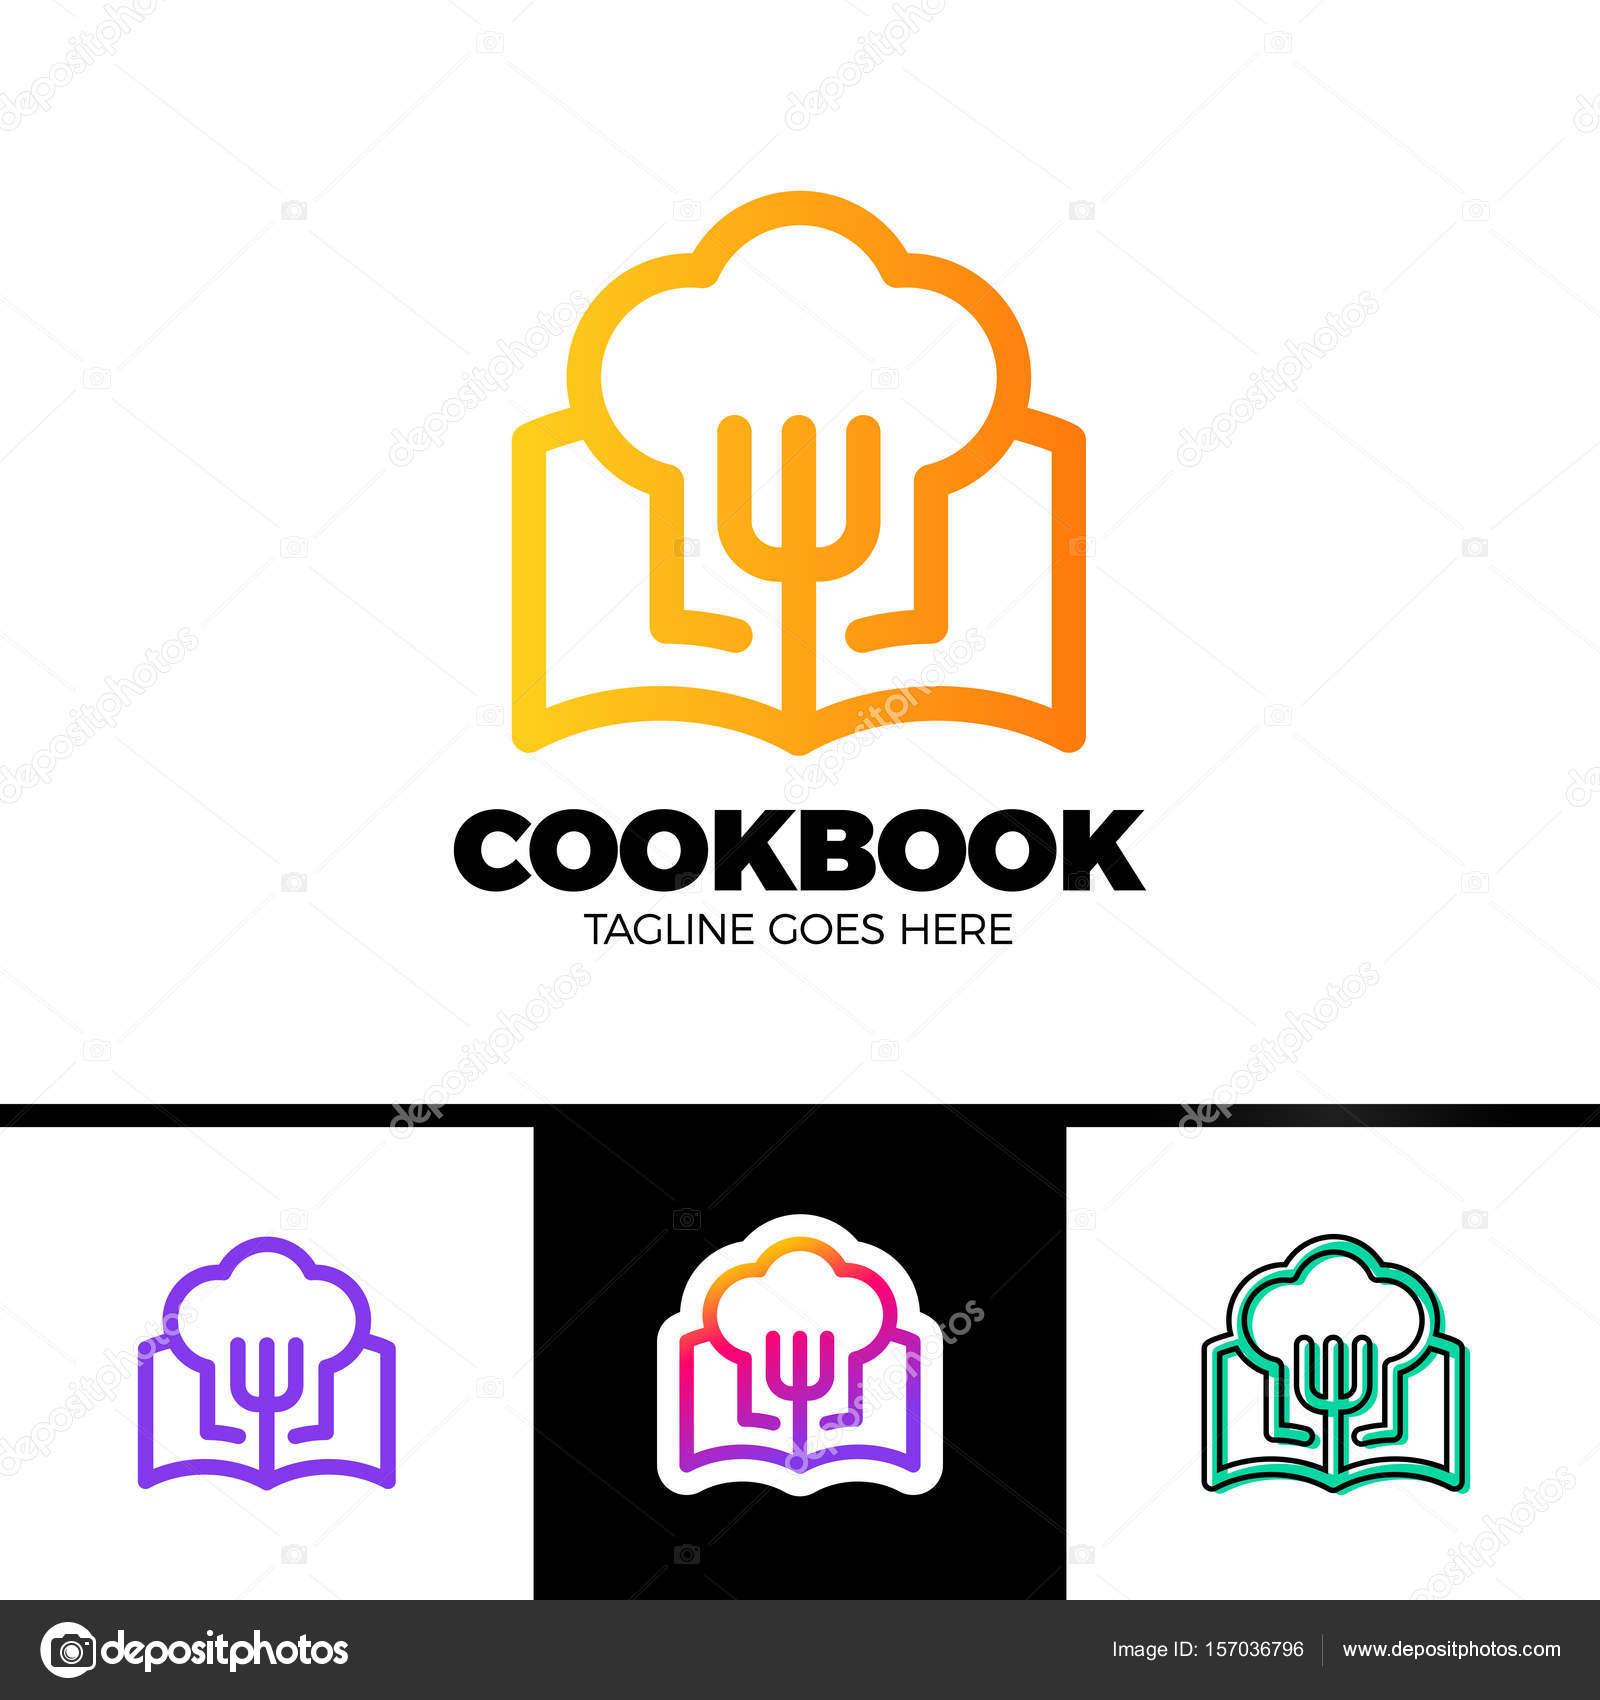 Rezept Buch Vorlage Logodesign in Umriss-Stil Vektor-Design ...